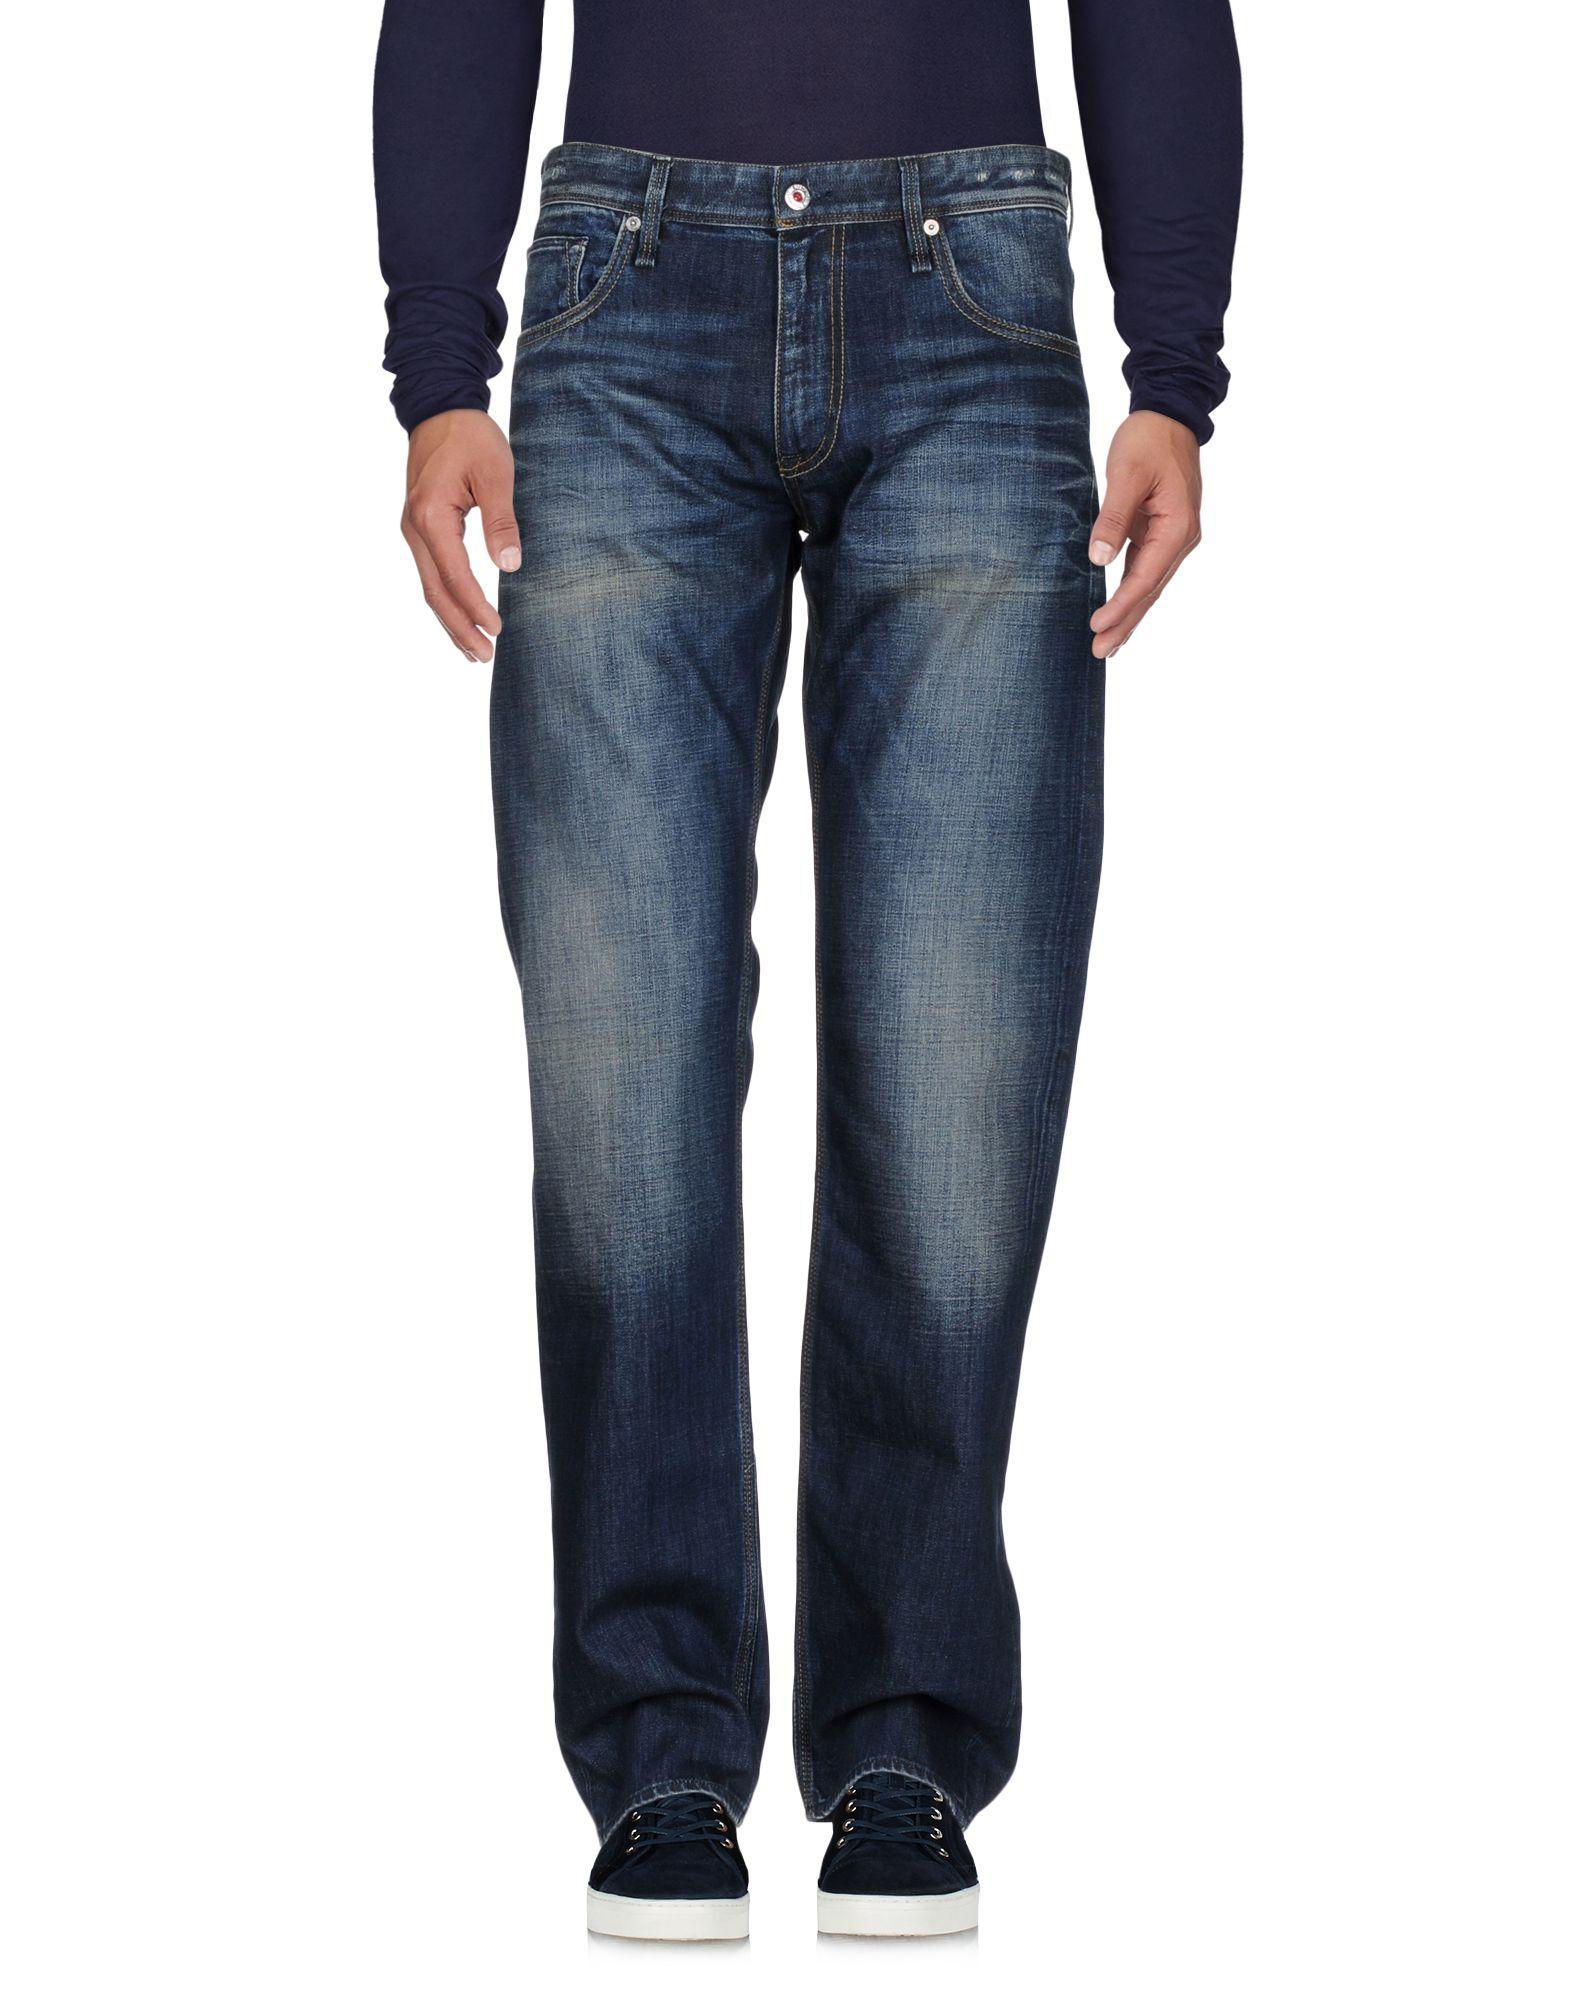 Pantaloni Jeans Love Moschino Uomo Uomo Moschino - 42670156JQ bf15a7